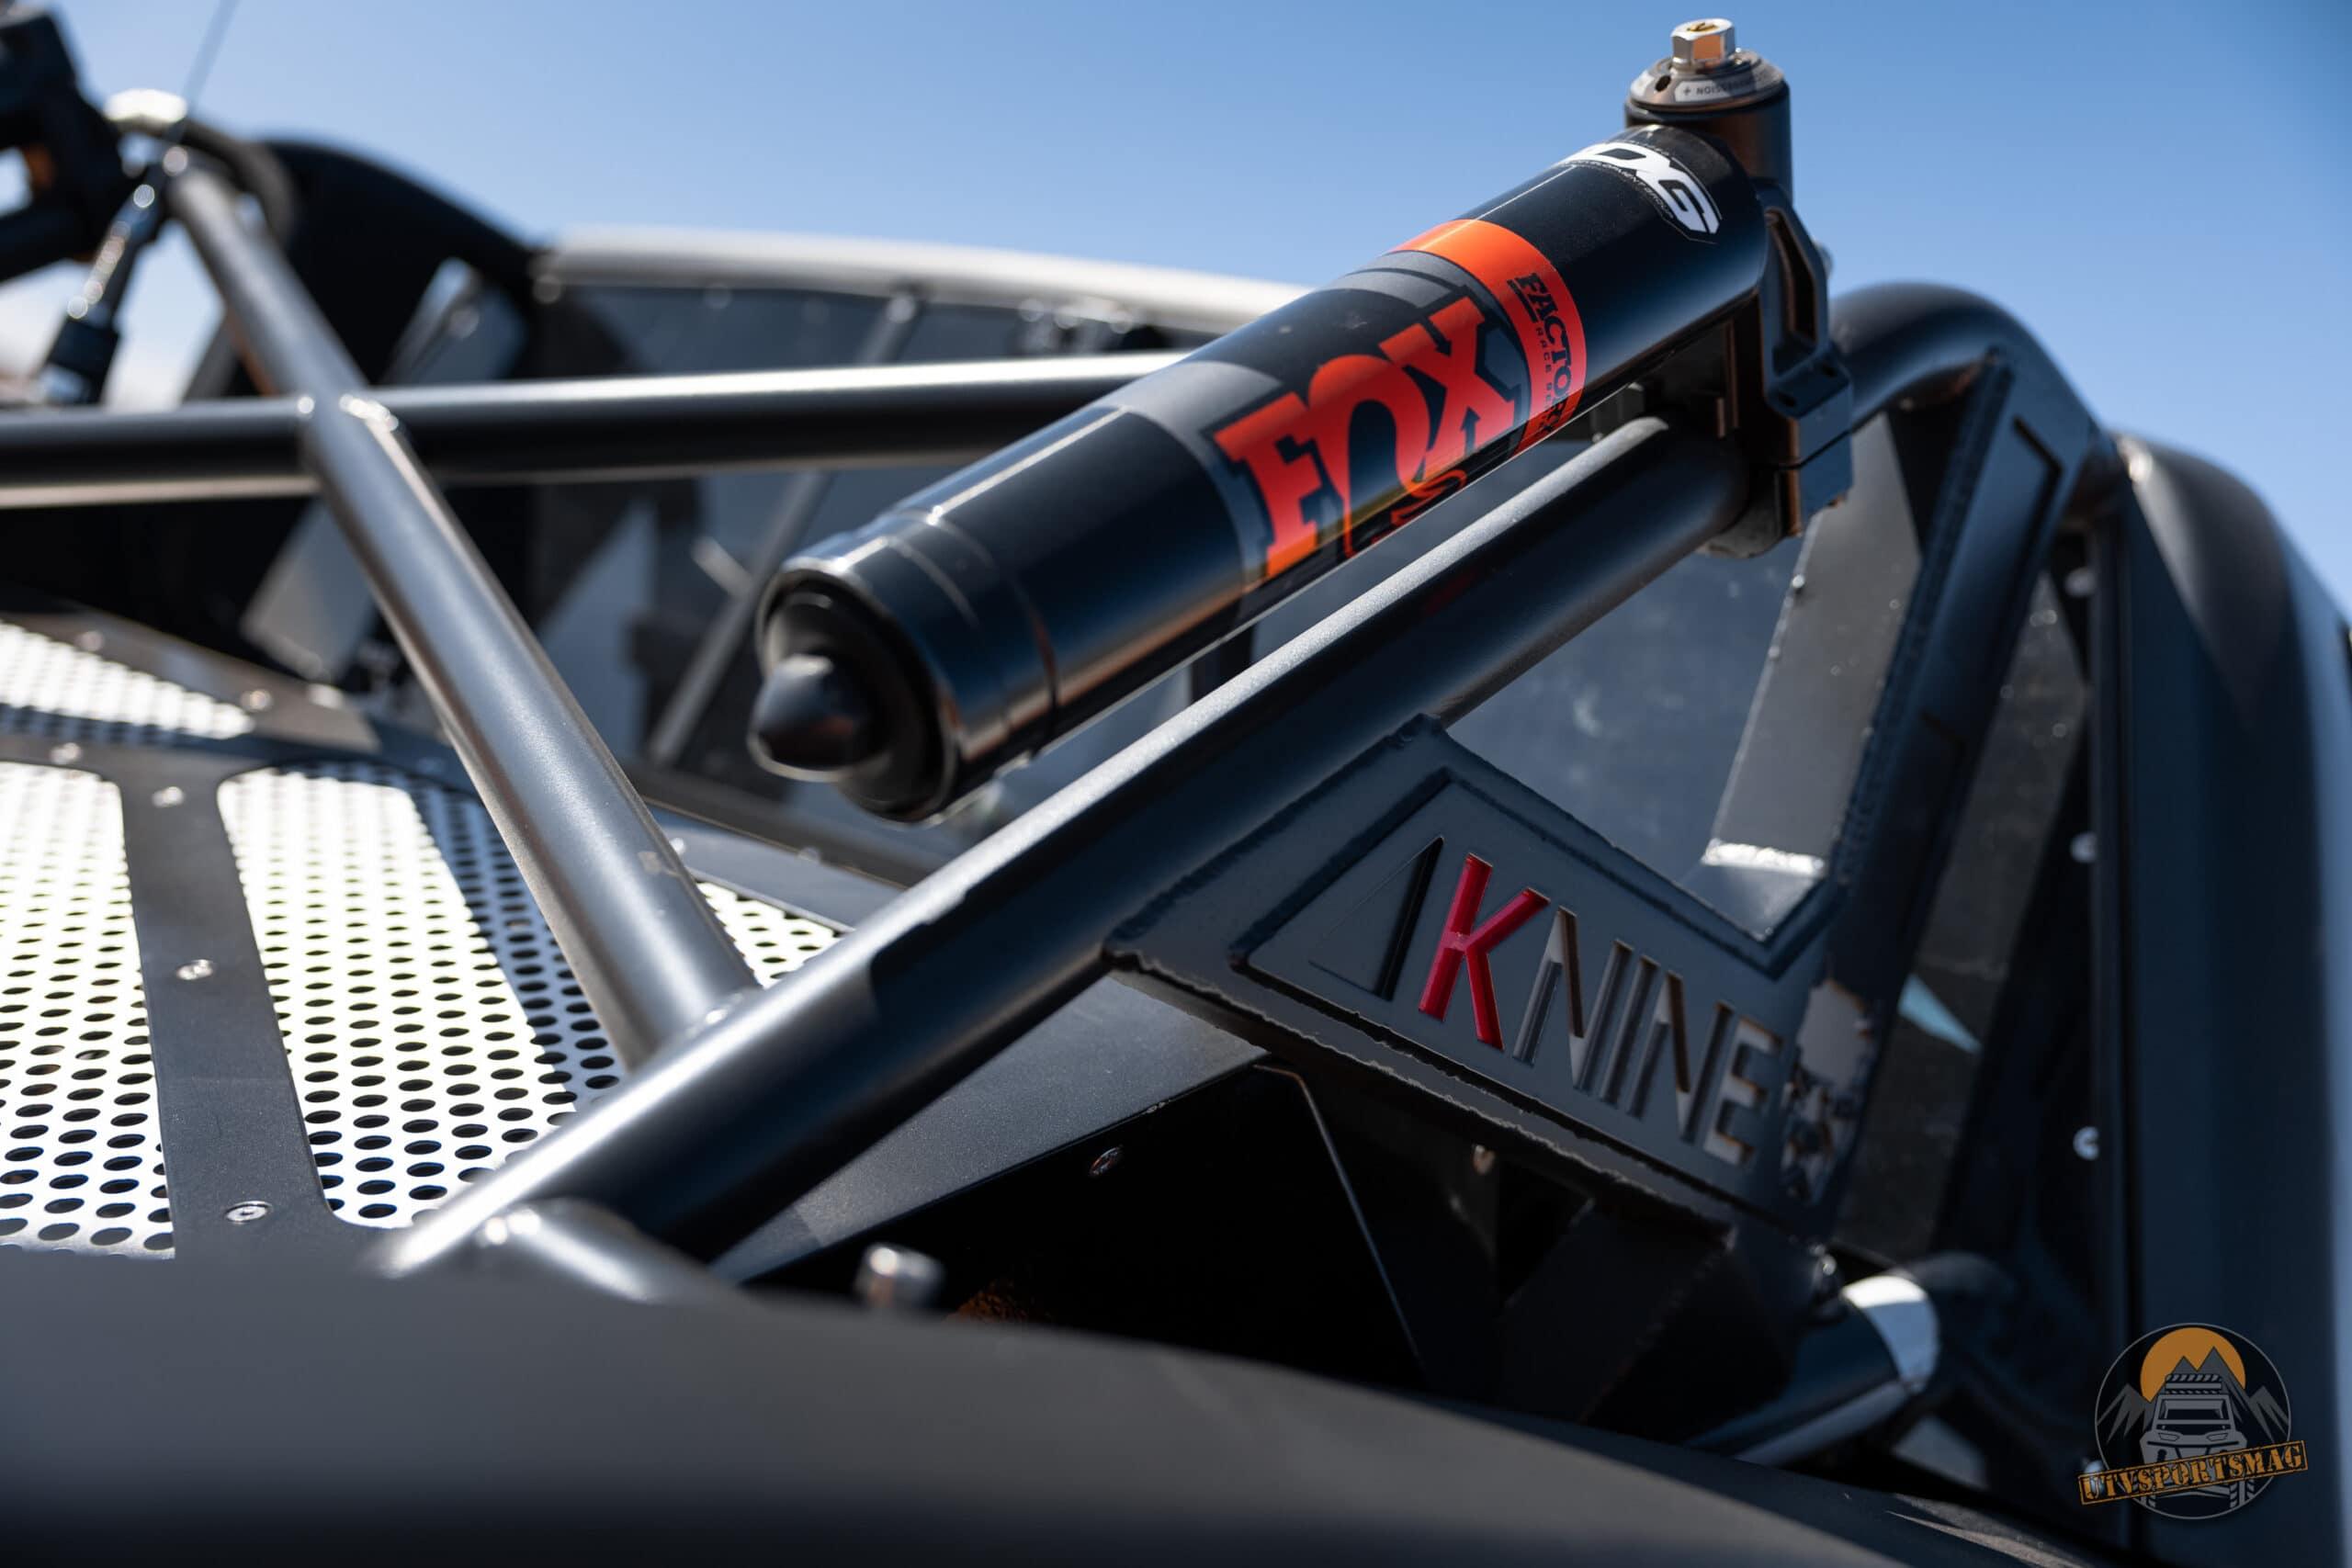 Knine Racing